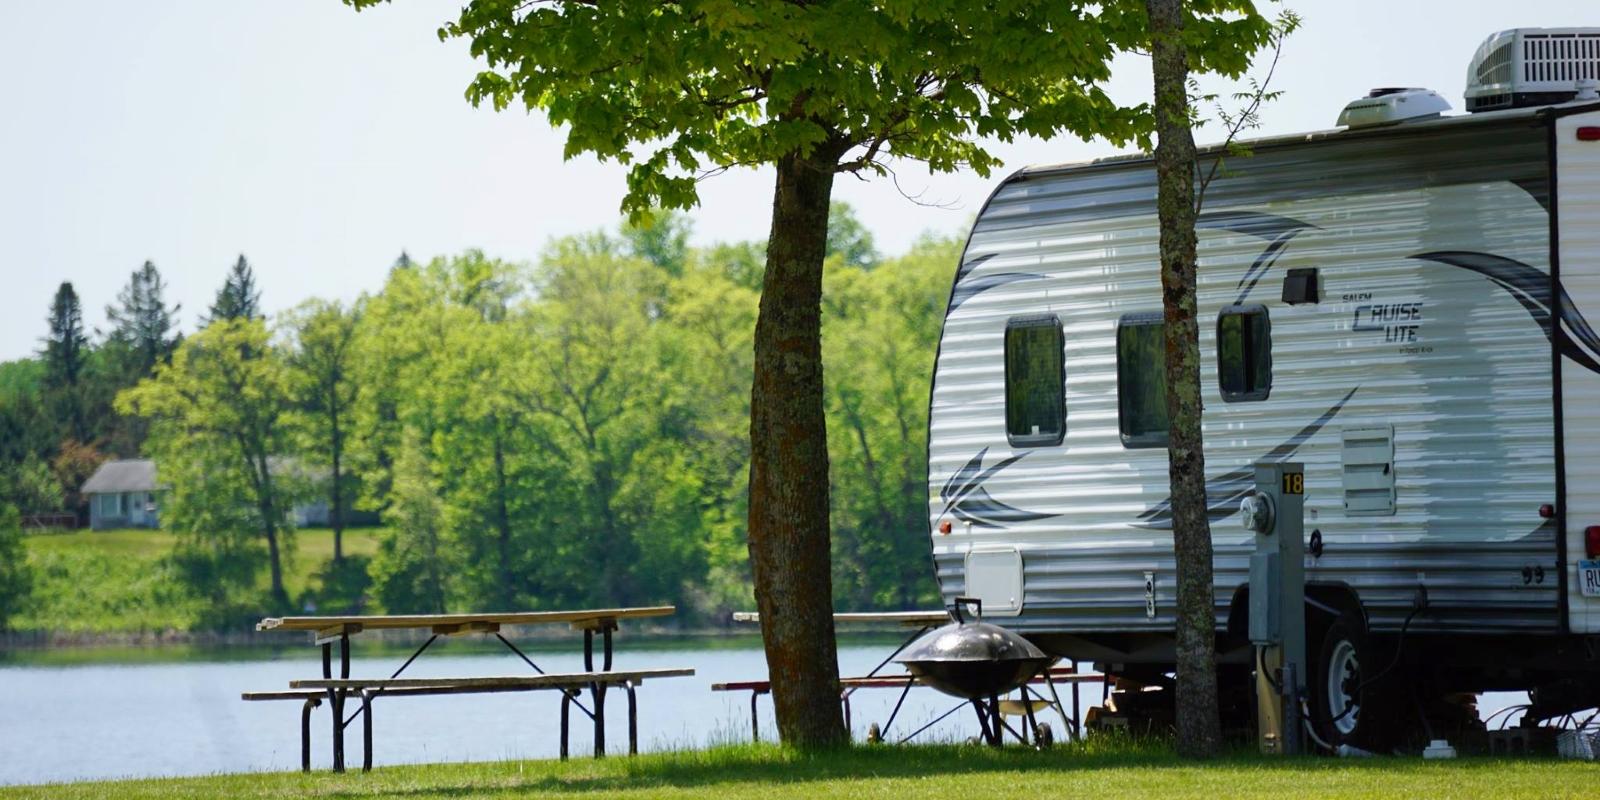 Hamilton's Fox Lake Campground